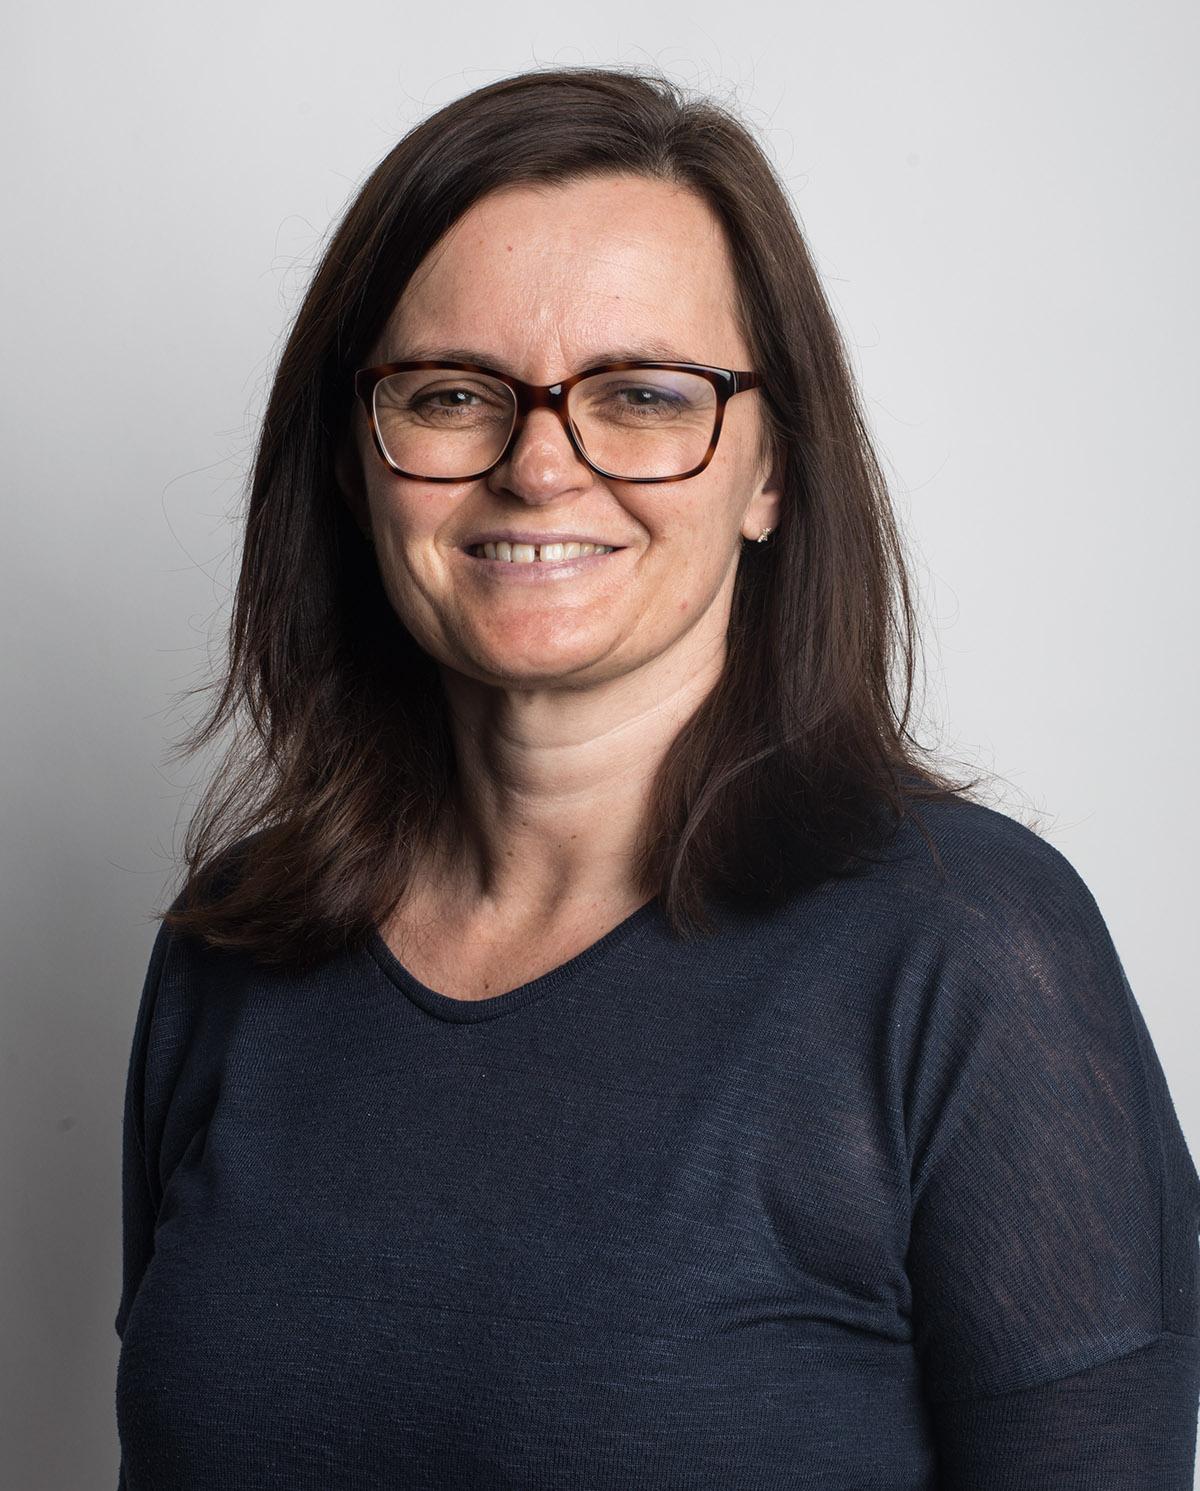 Eva Pfannhauser